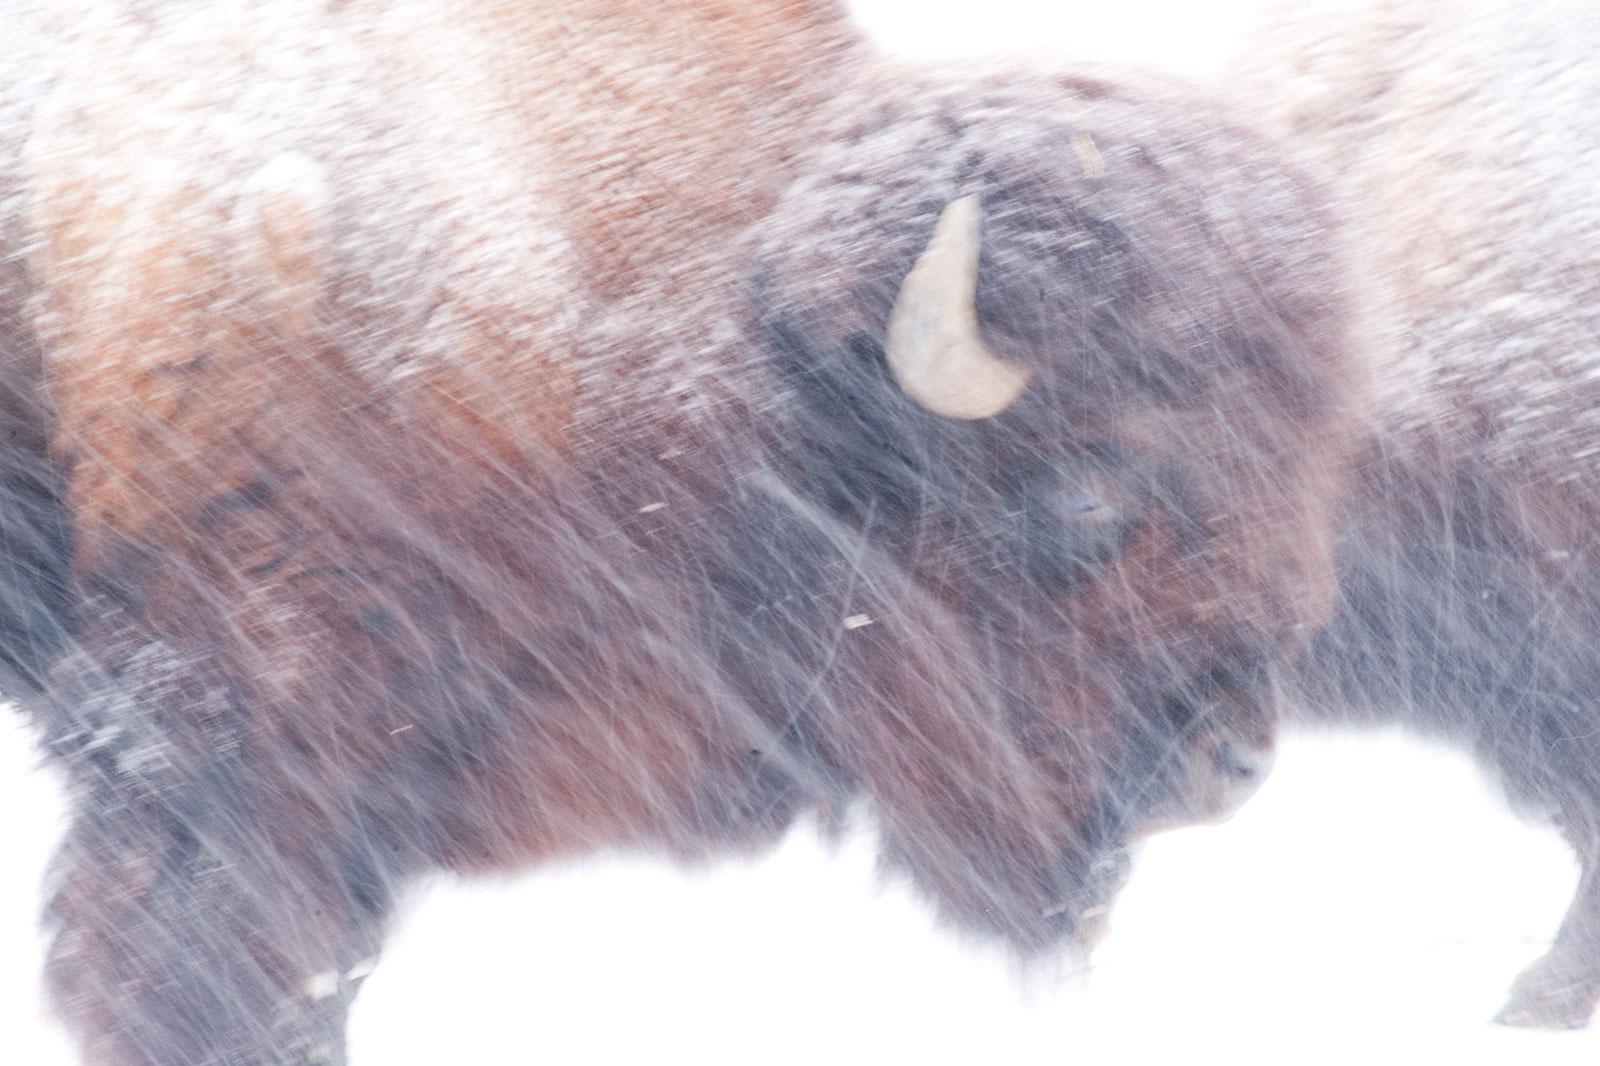 Wild beasts in the snow, Januari 2010